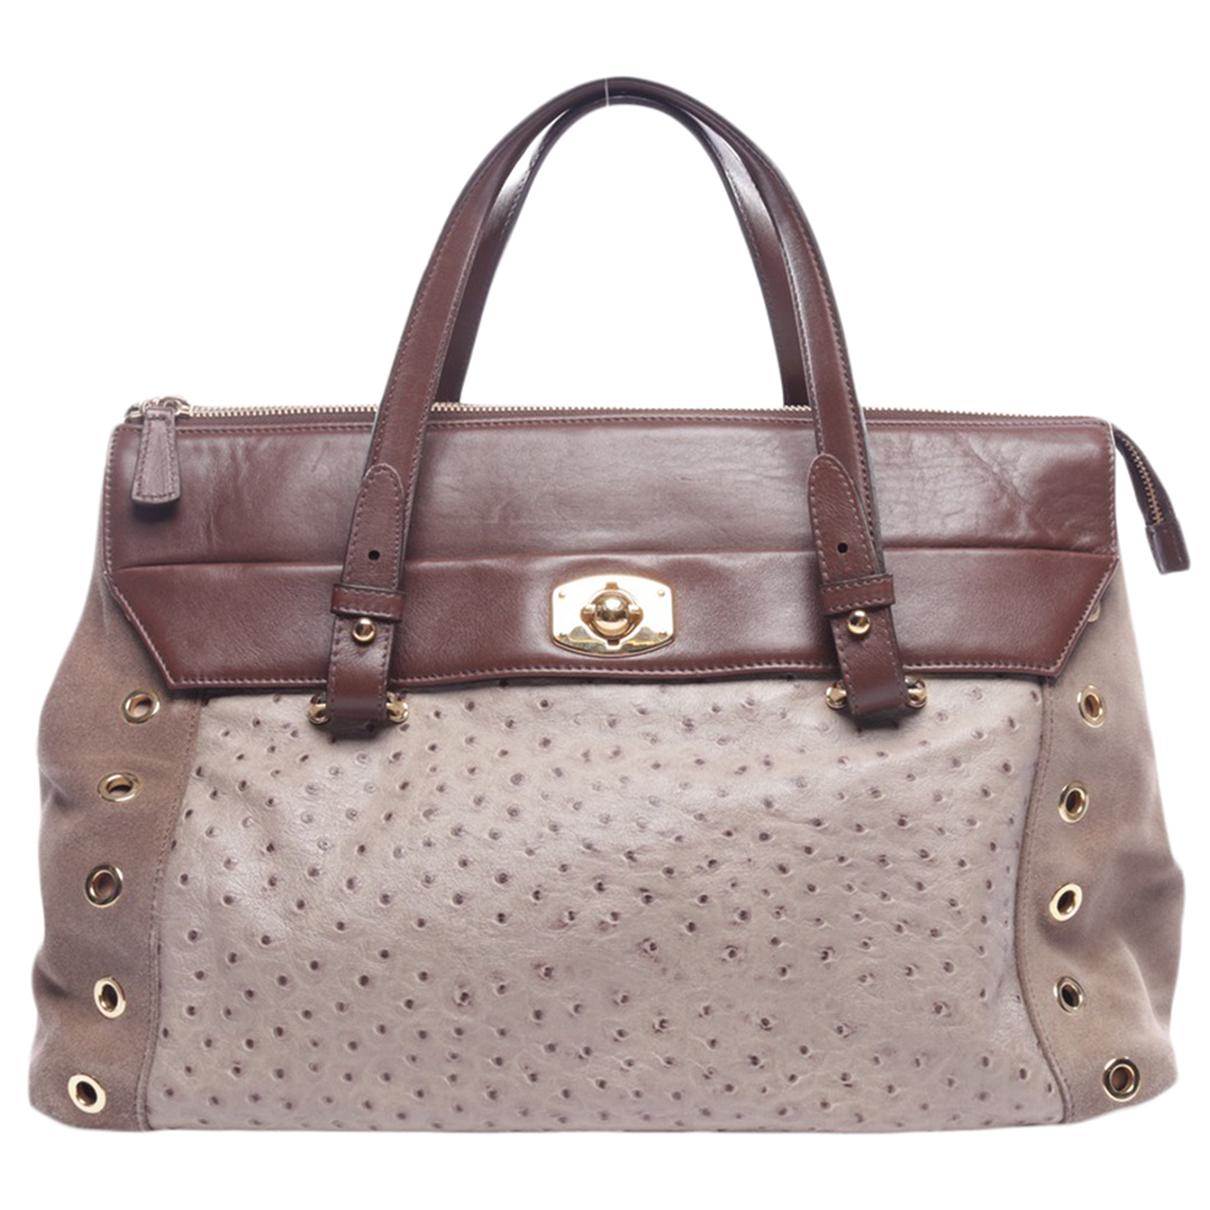 Furla \N Beige Leather handbag for Women \N